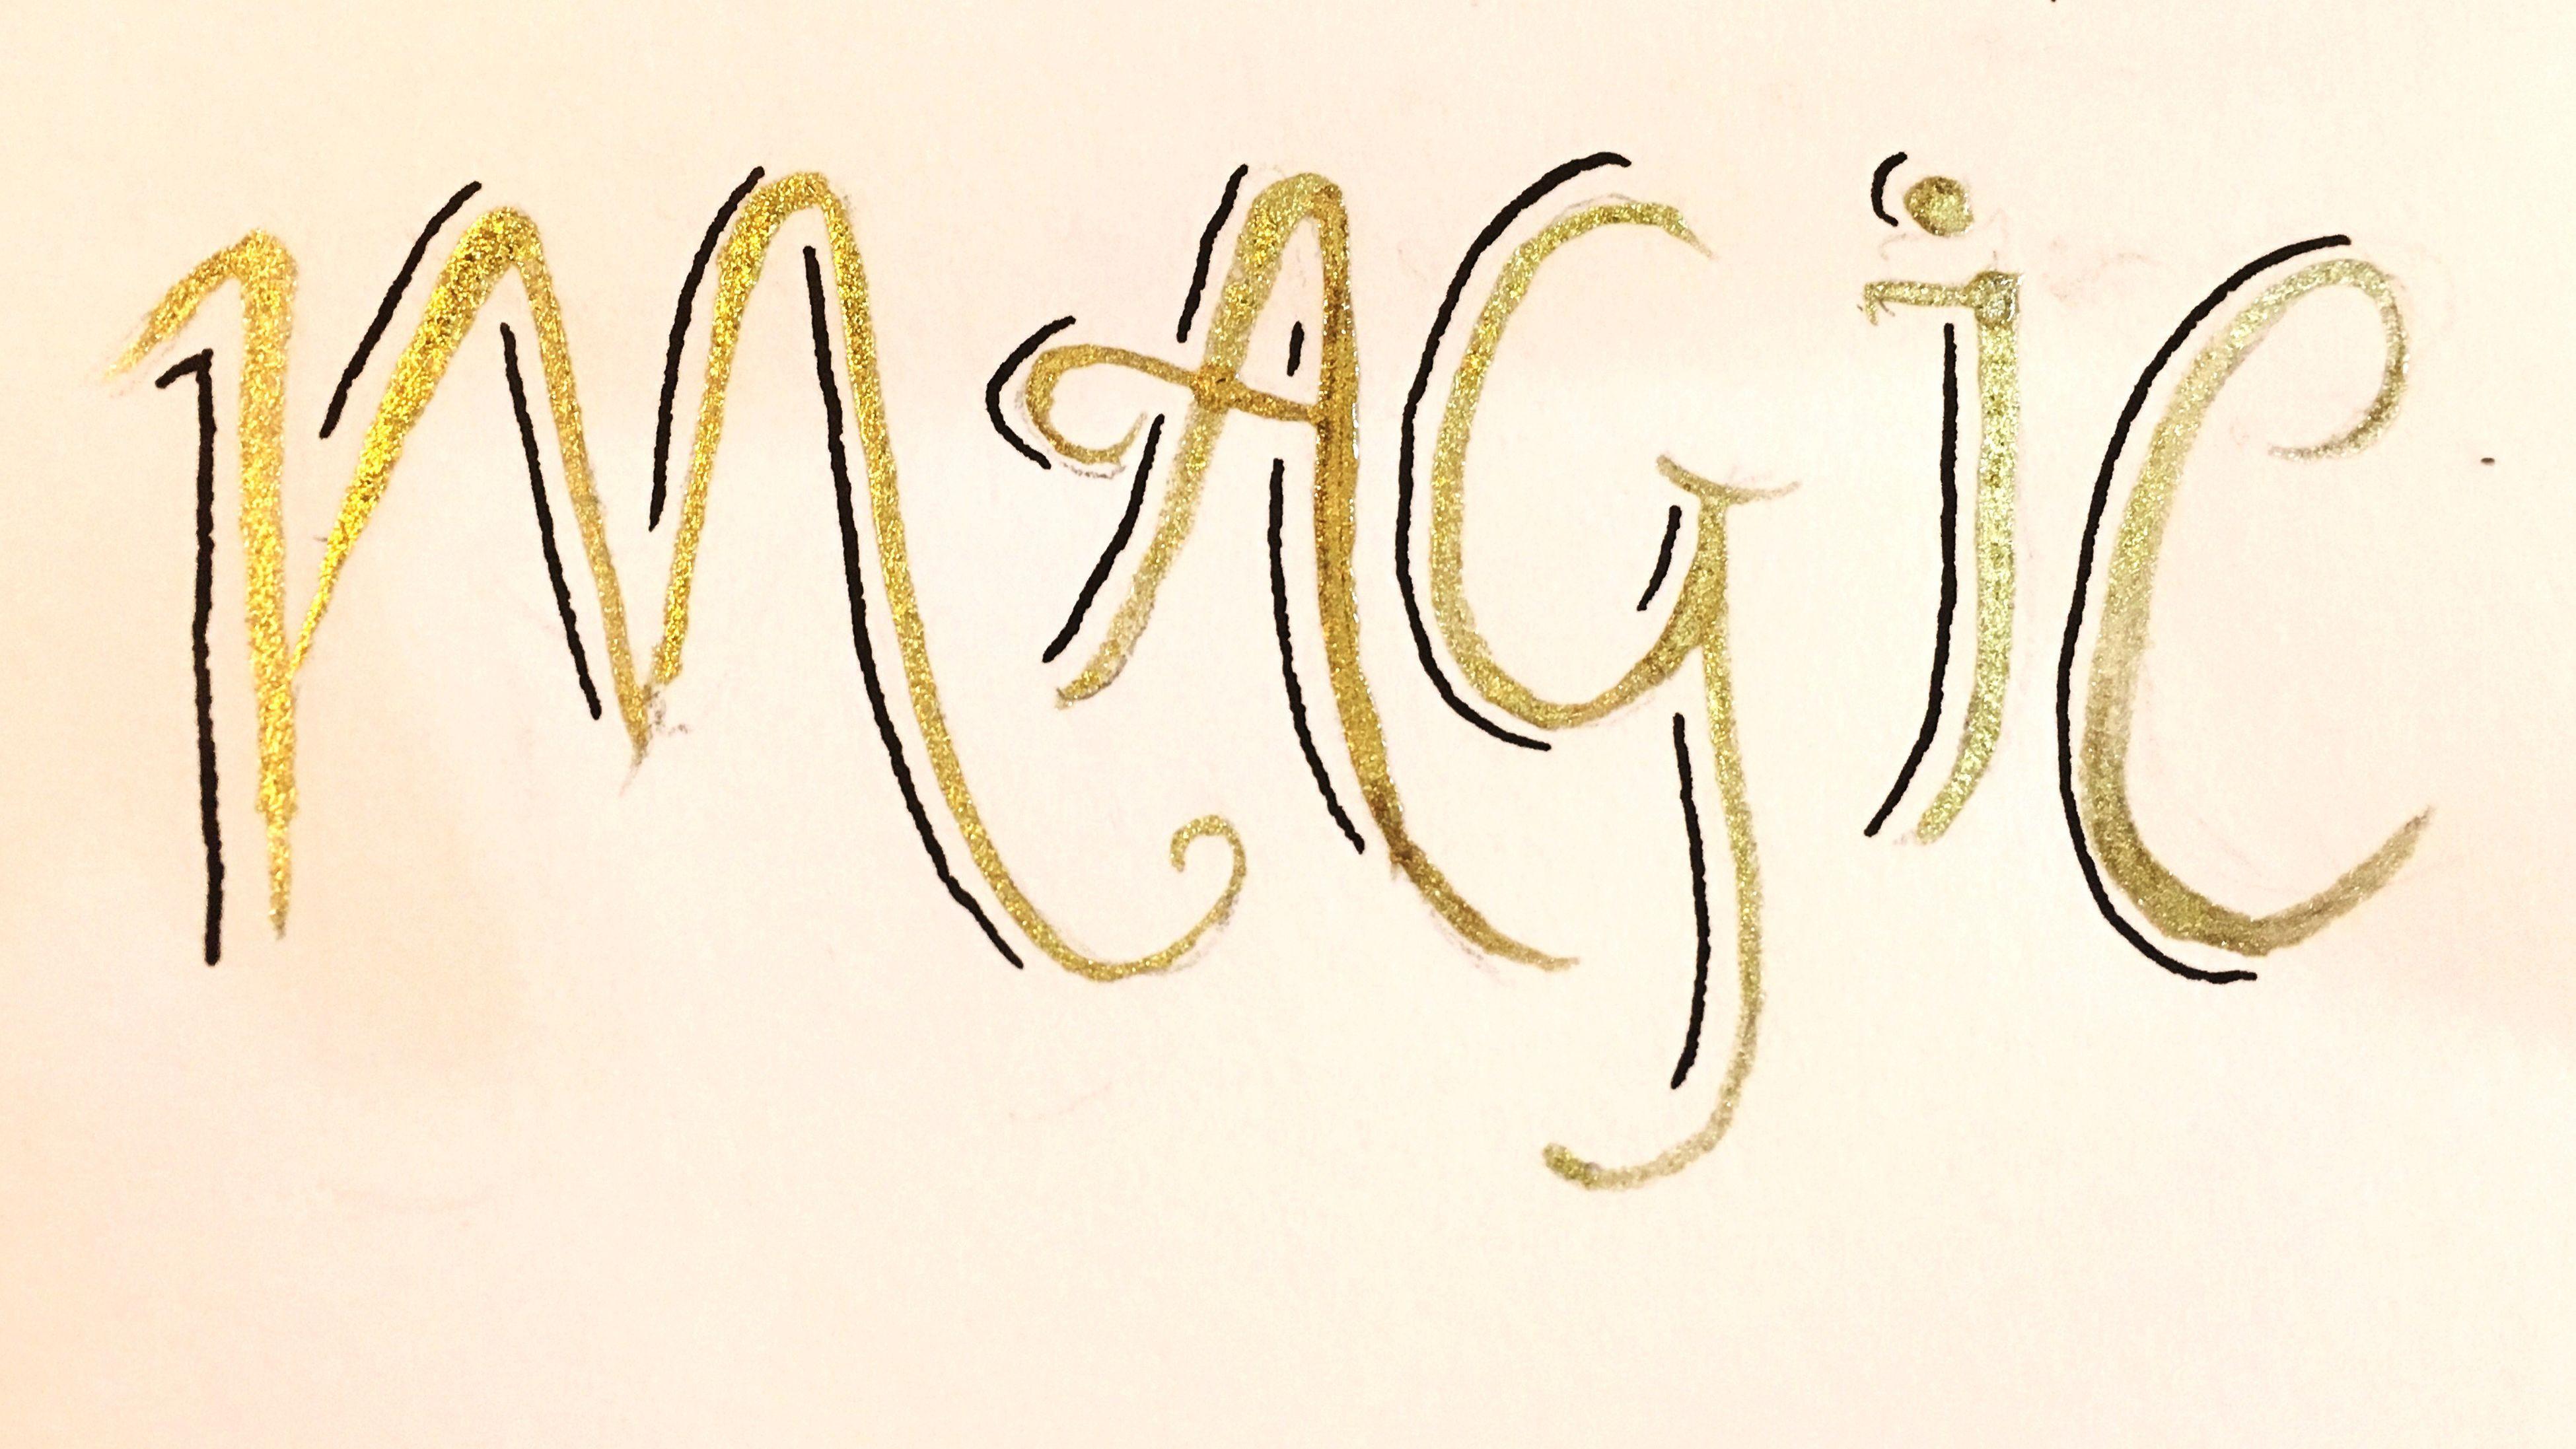 text, western script, white background, studio shot, close-up, creativity, still life, art, ideas, no people, written, cut out, information, writing, detail